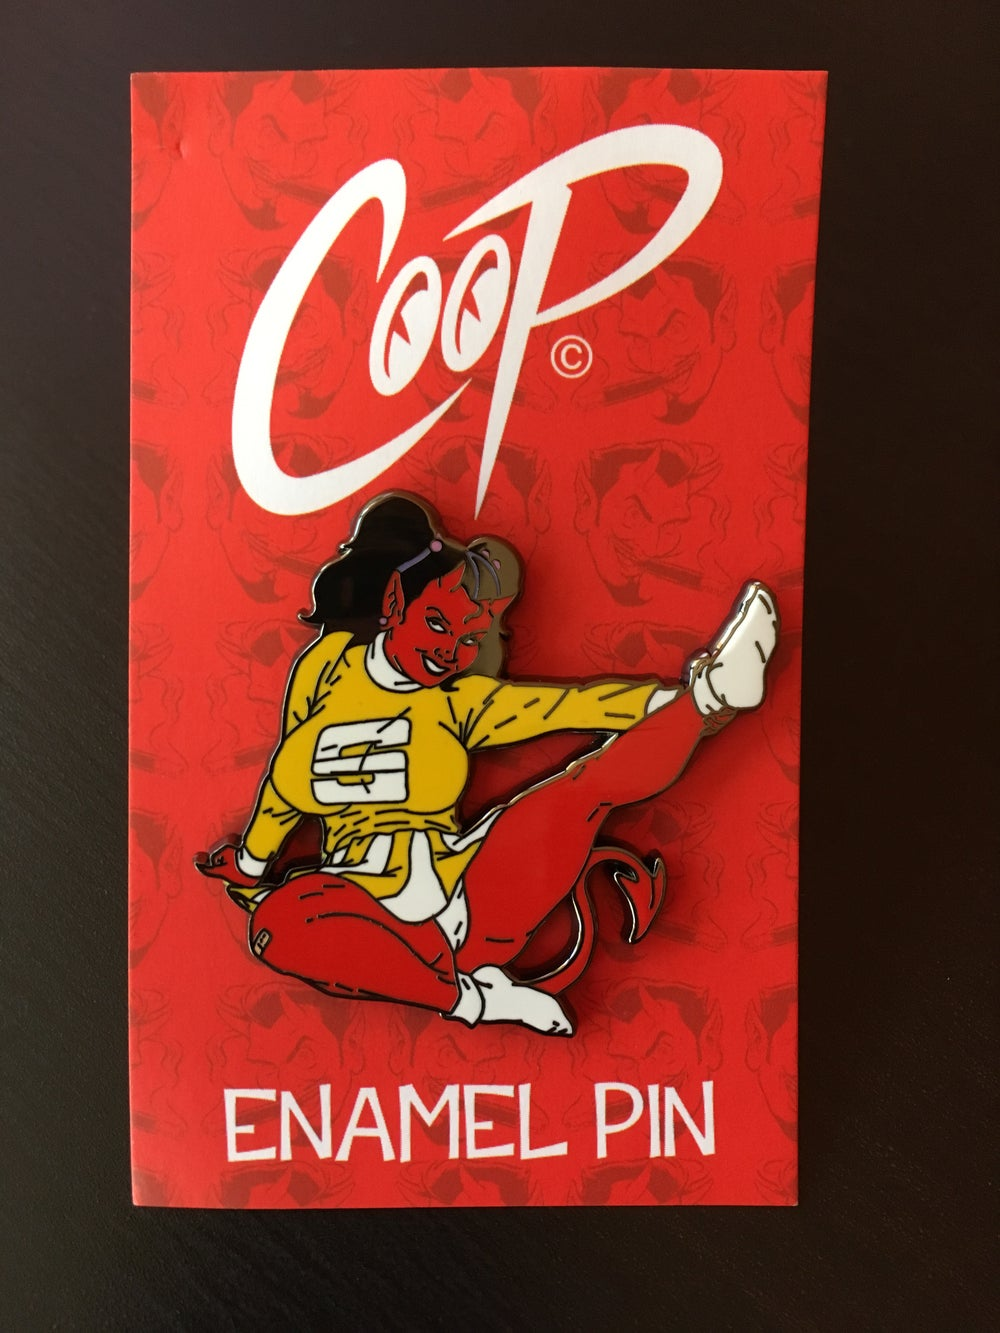 Image of SATAN'S CHEERLEADER enamel pin